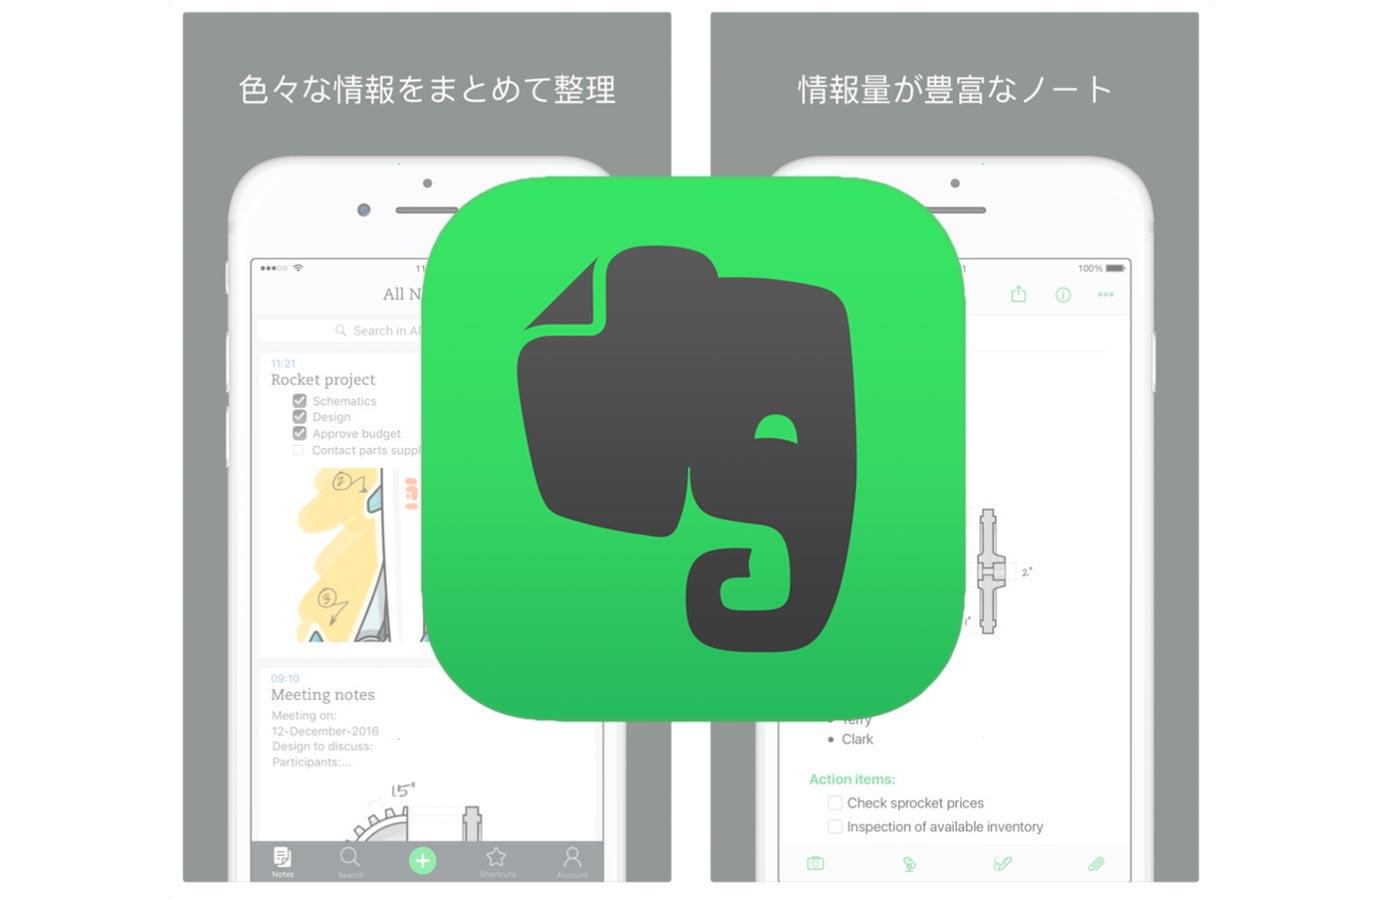 iOSアプリ「Evernote」がアップデートでコードブロックと表を含む、高度な書式の自動設定オプションが利用可能に